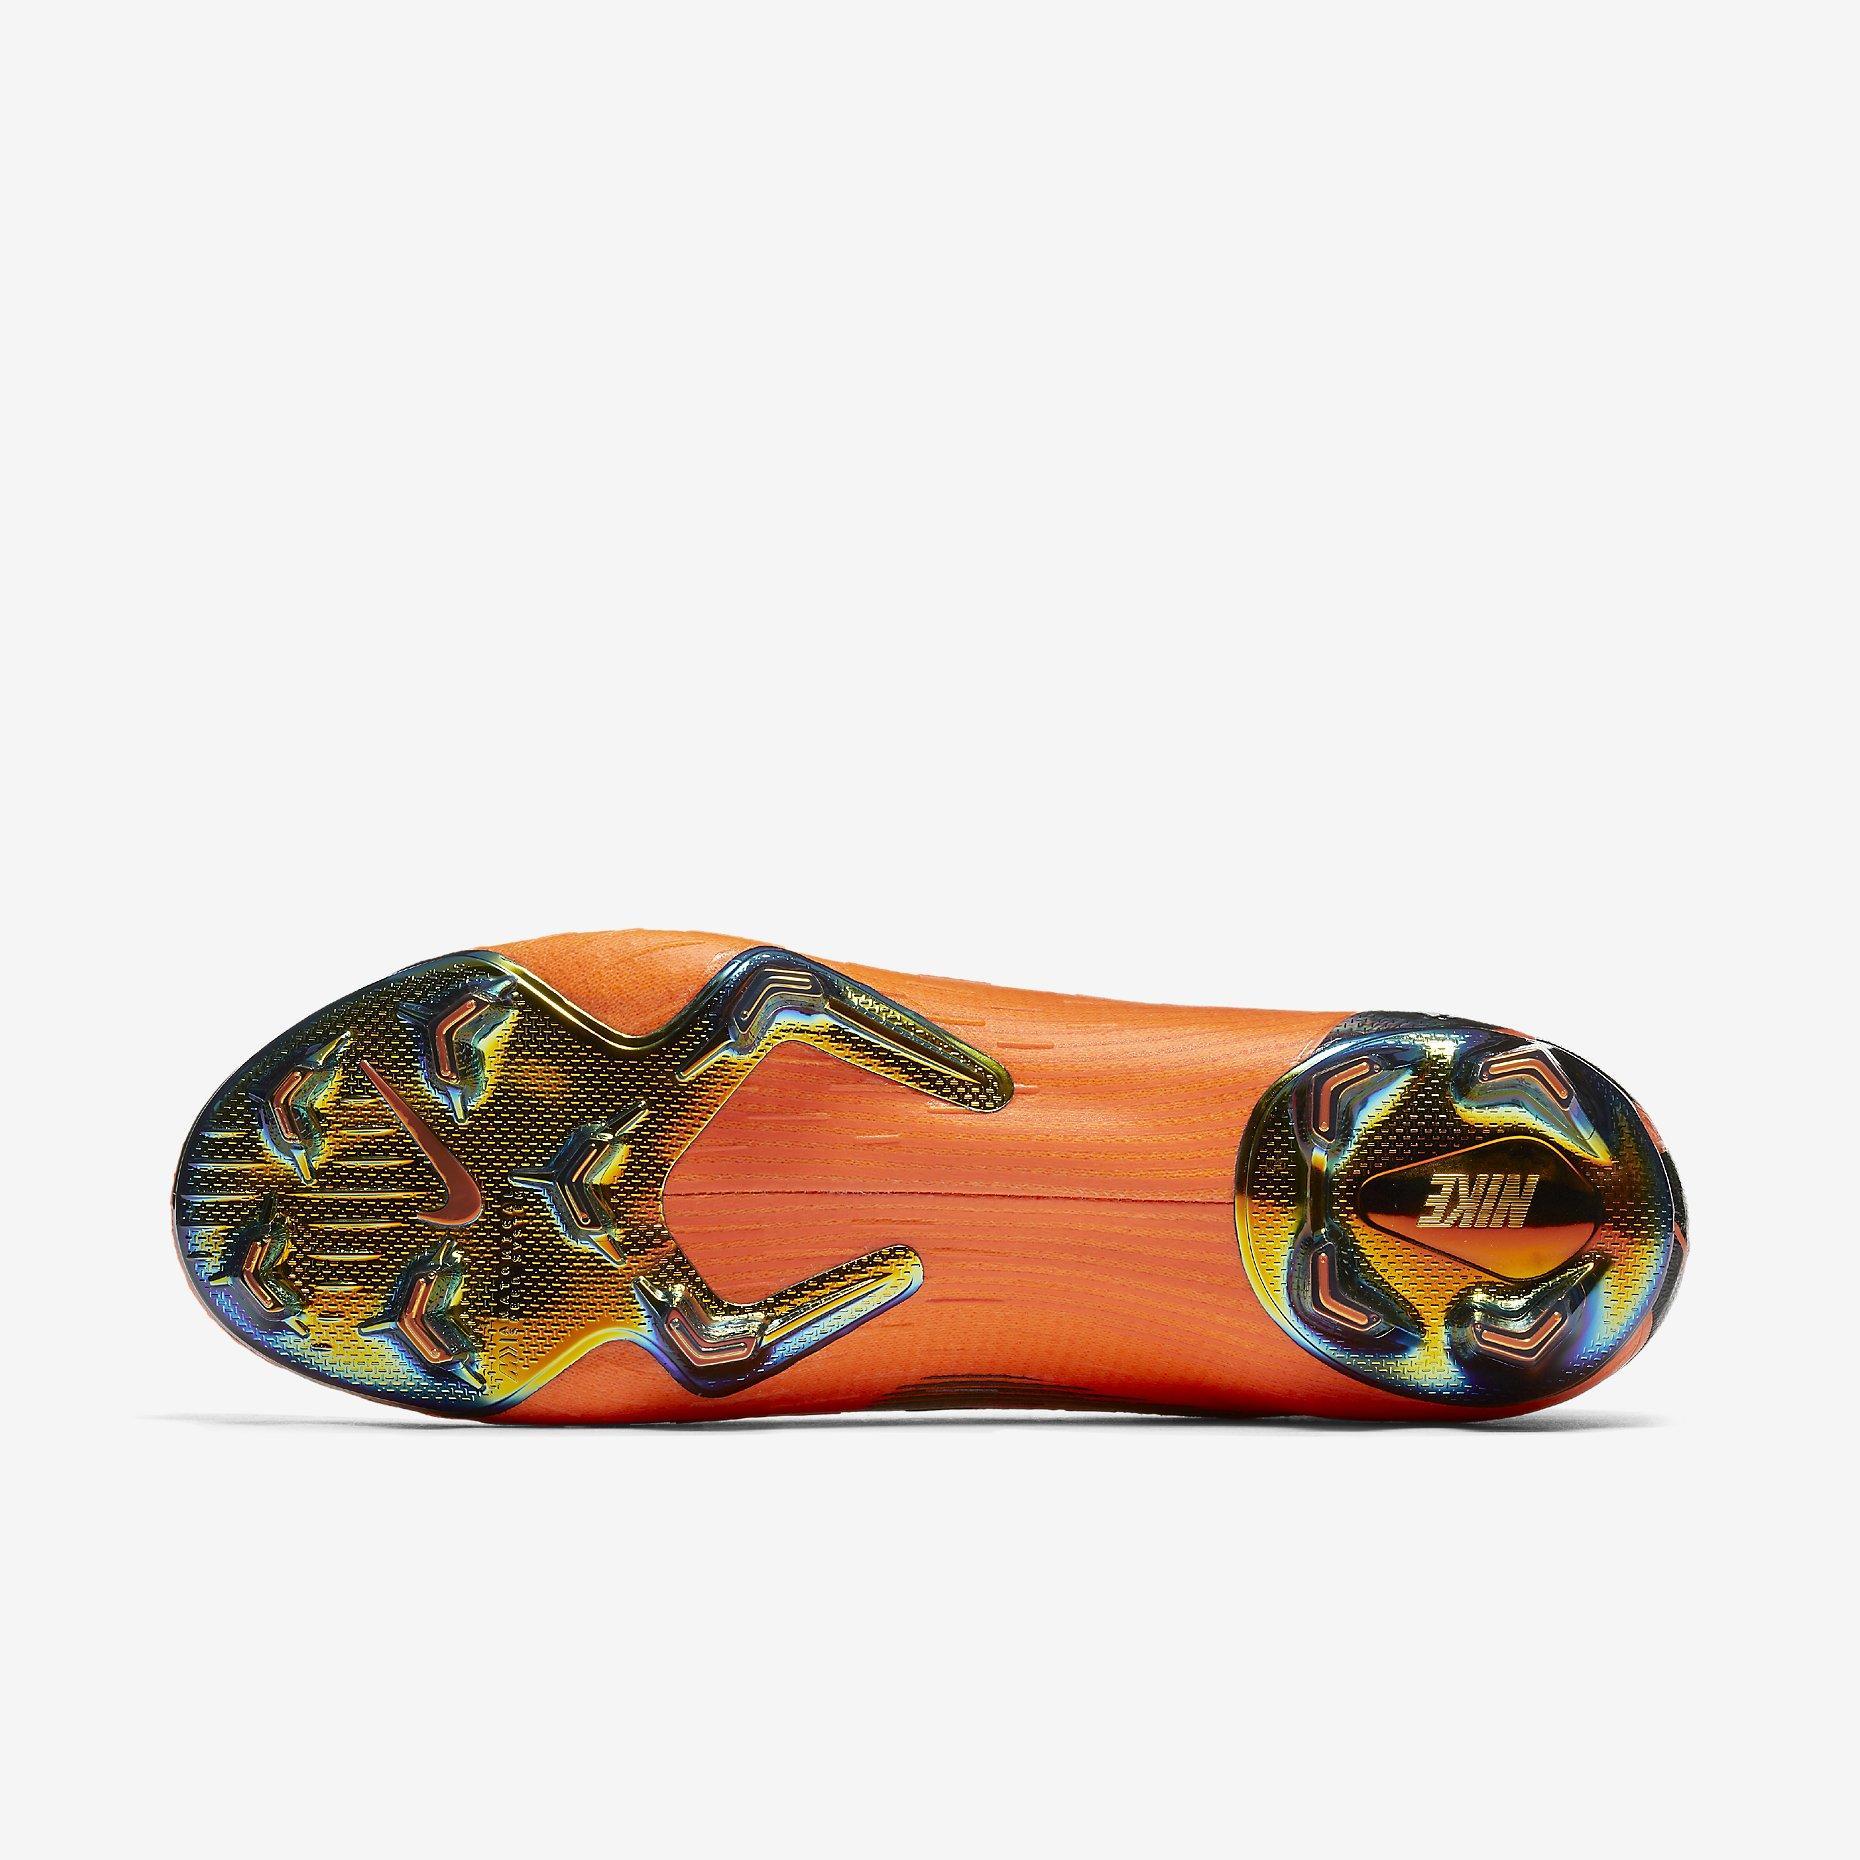 Nike Mercurial Superfly 360 Elite FG - Total Orange / Total Orange / Volt /  White